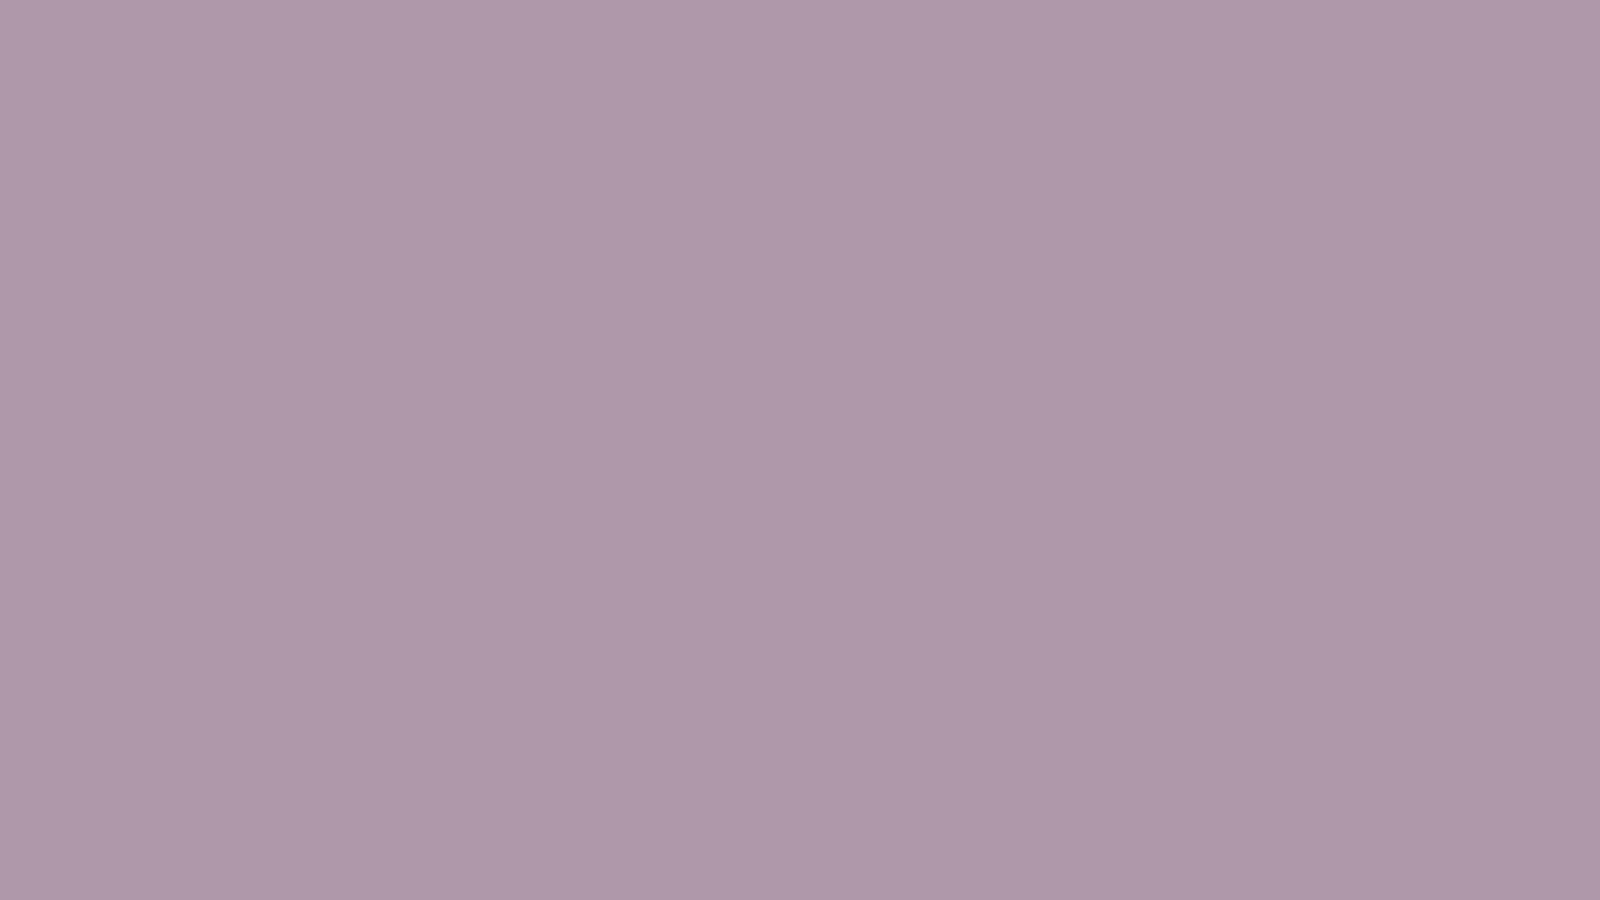 1600x900 Rose Quartz Solid Color Background